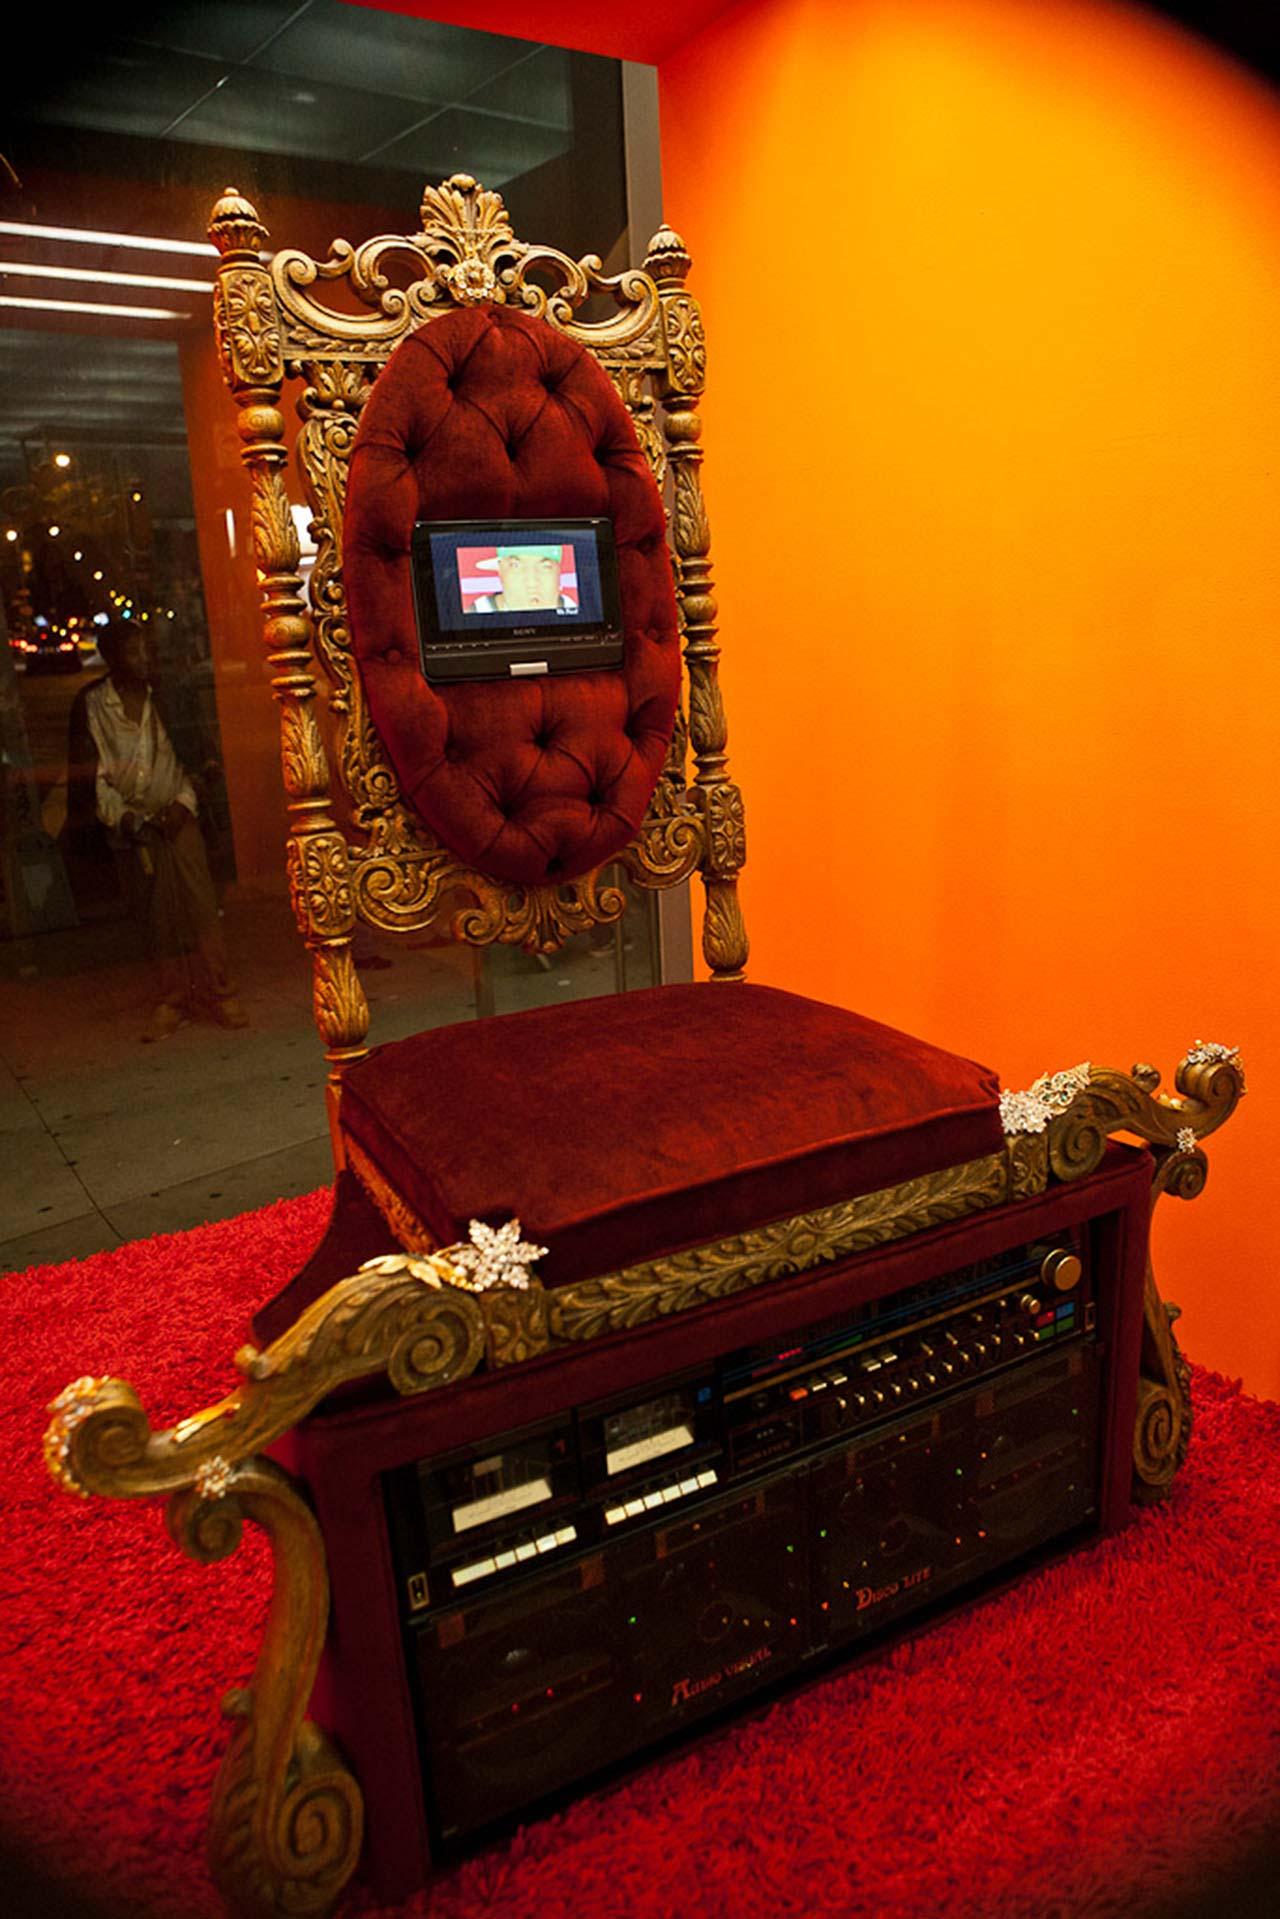 Untitled (Throne)